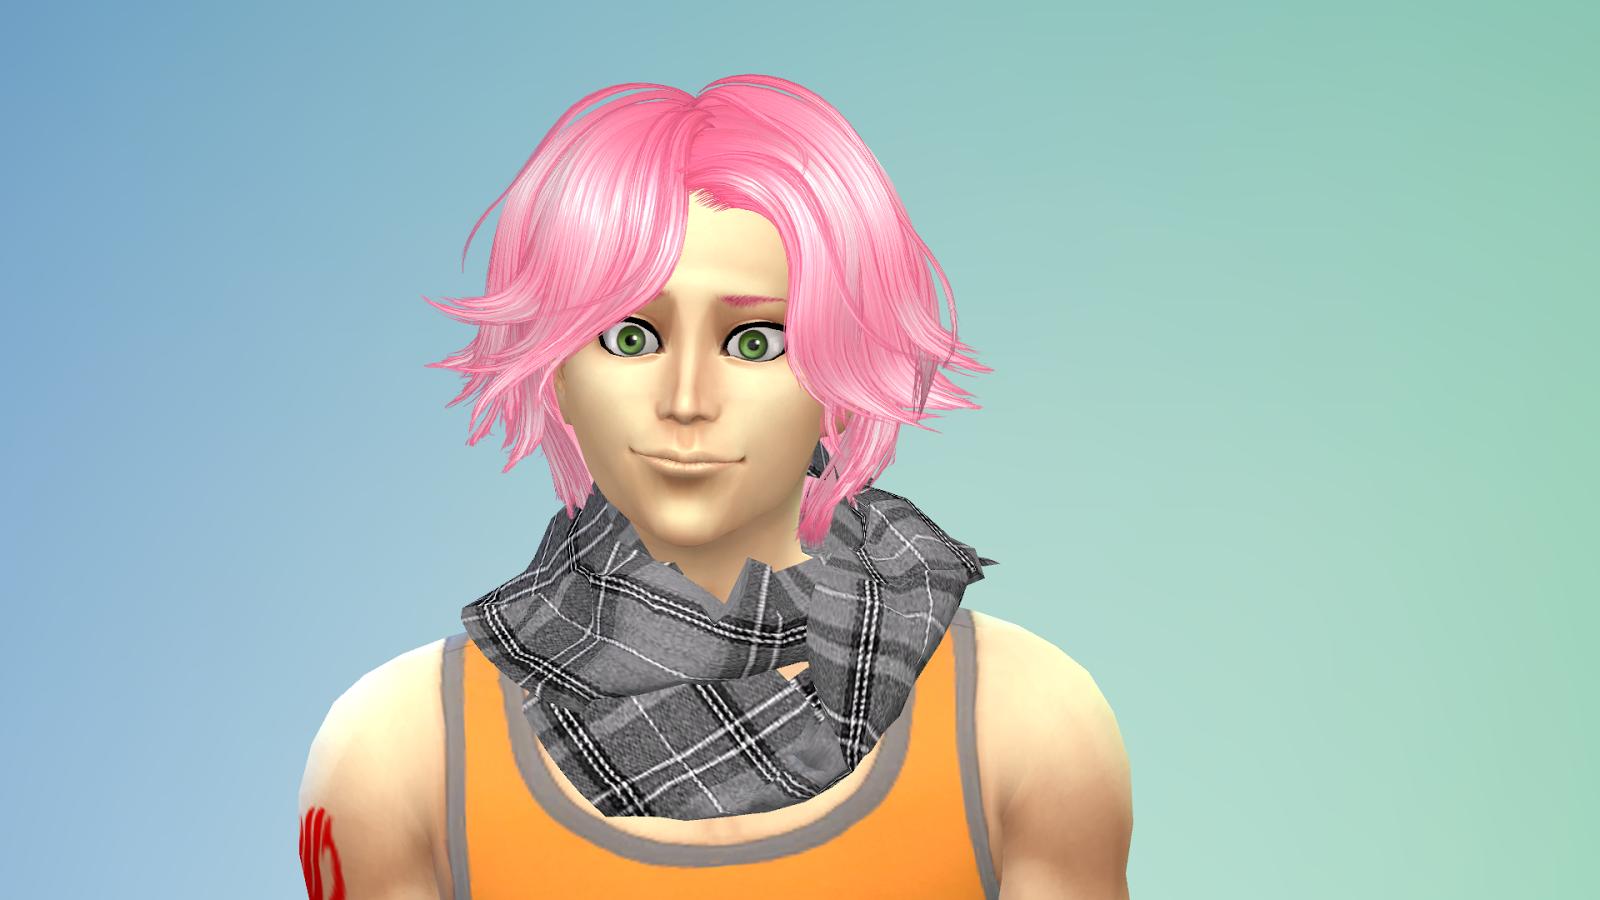 Sims 4 Anime Characters : Ng sims natsu lucy ts model